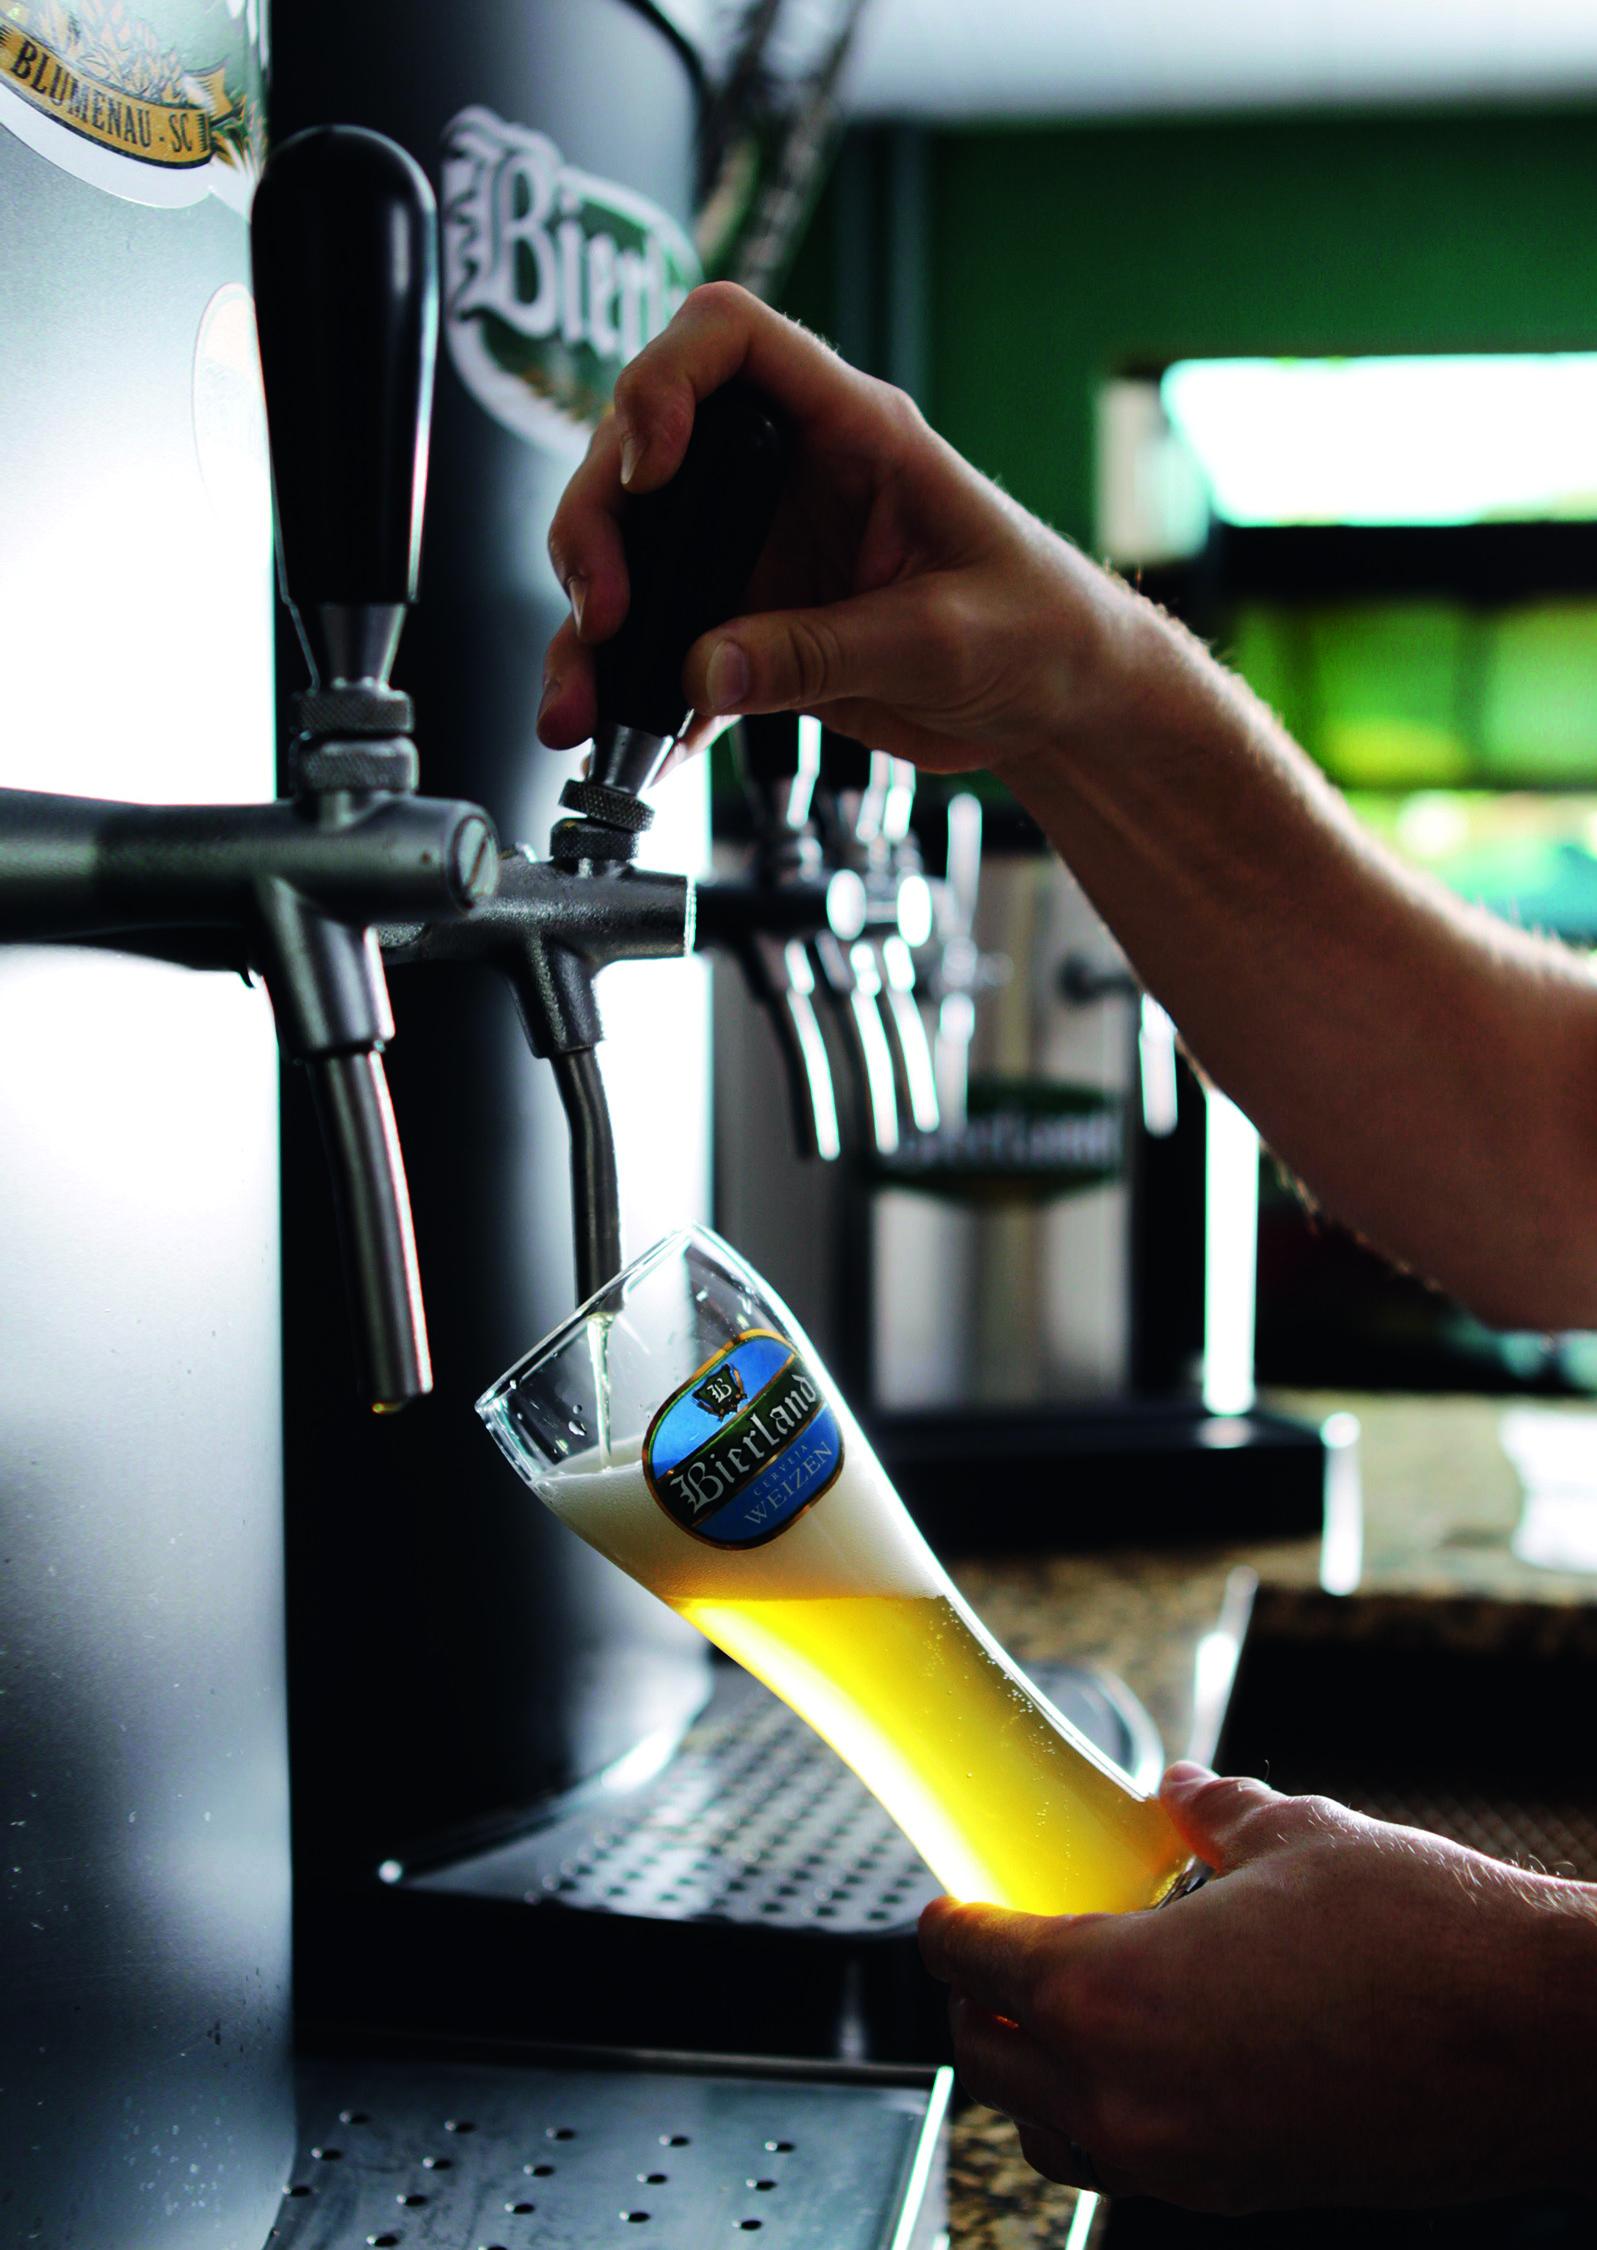 Chope da Cervejaria Bierland.